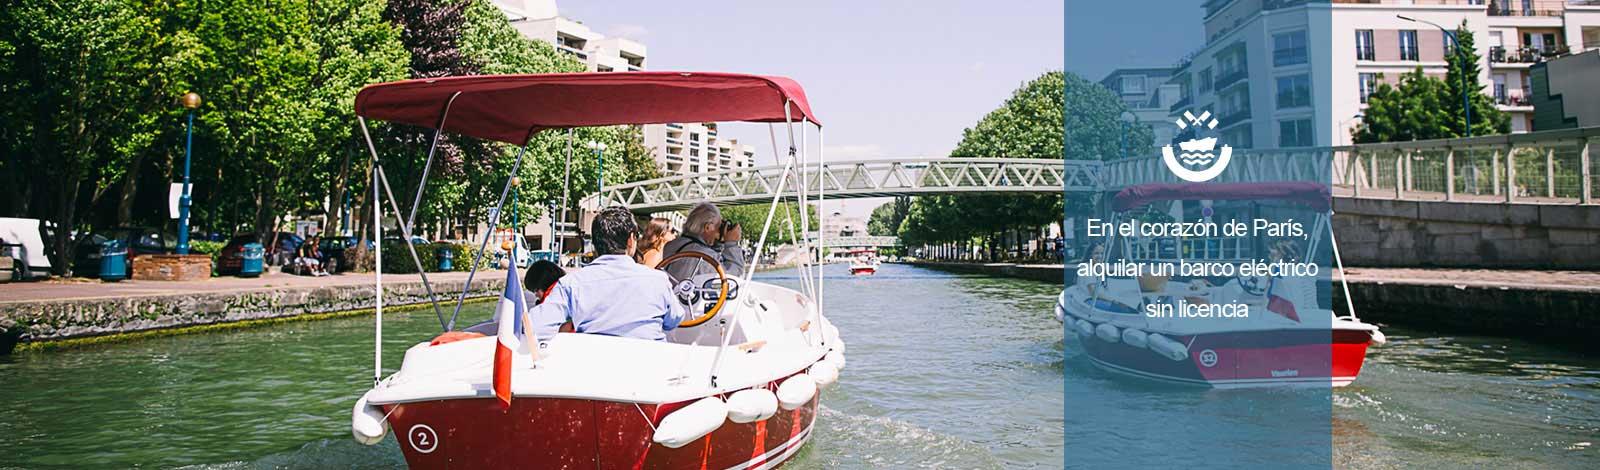 Barcos paseo canal de l'Ourcq